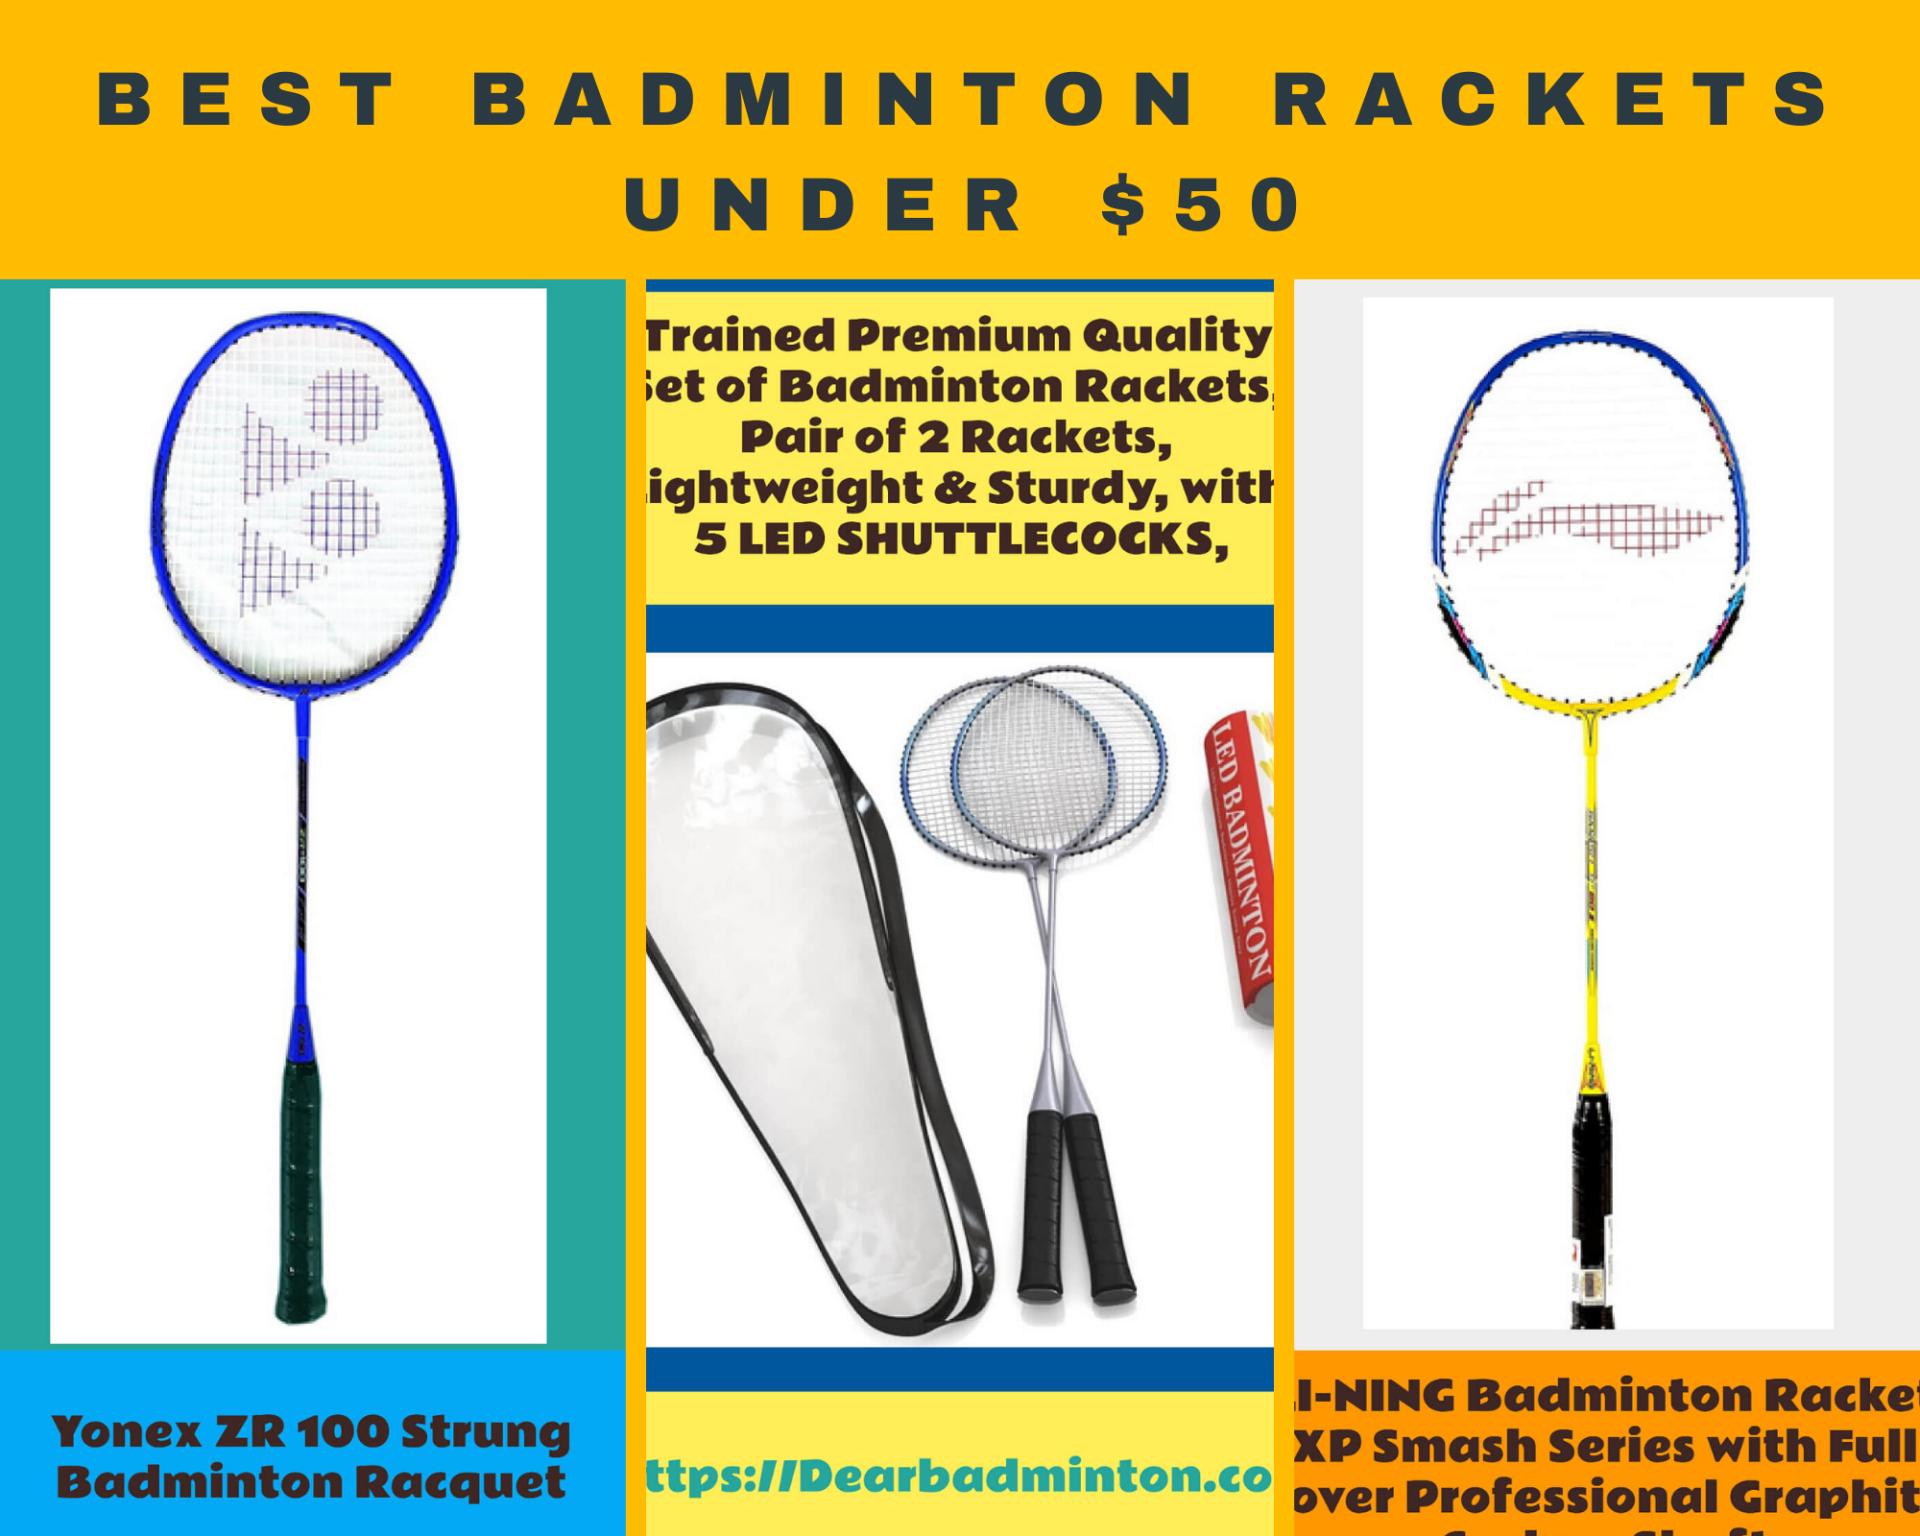 Best badminton rackets under $50, reviews, suggestion, expert guide